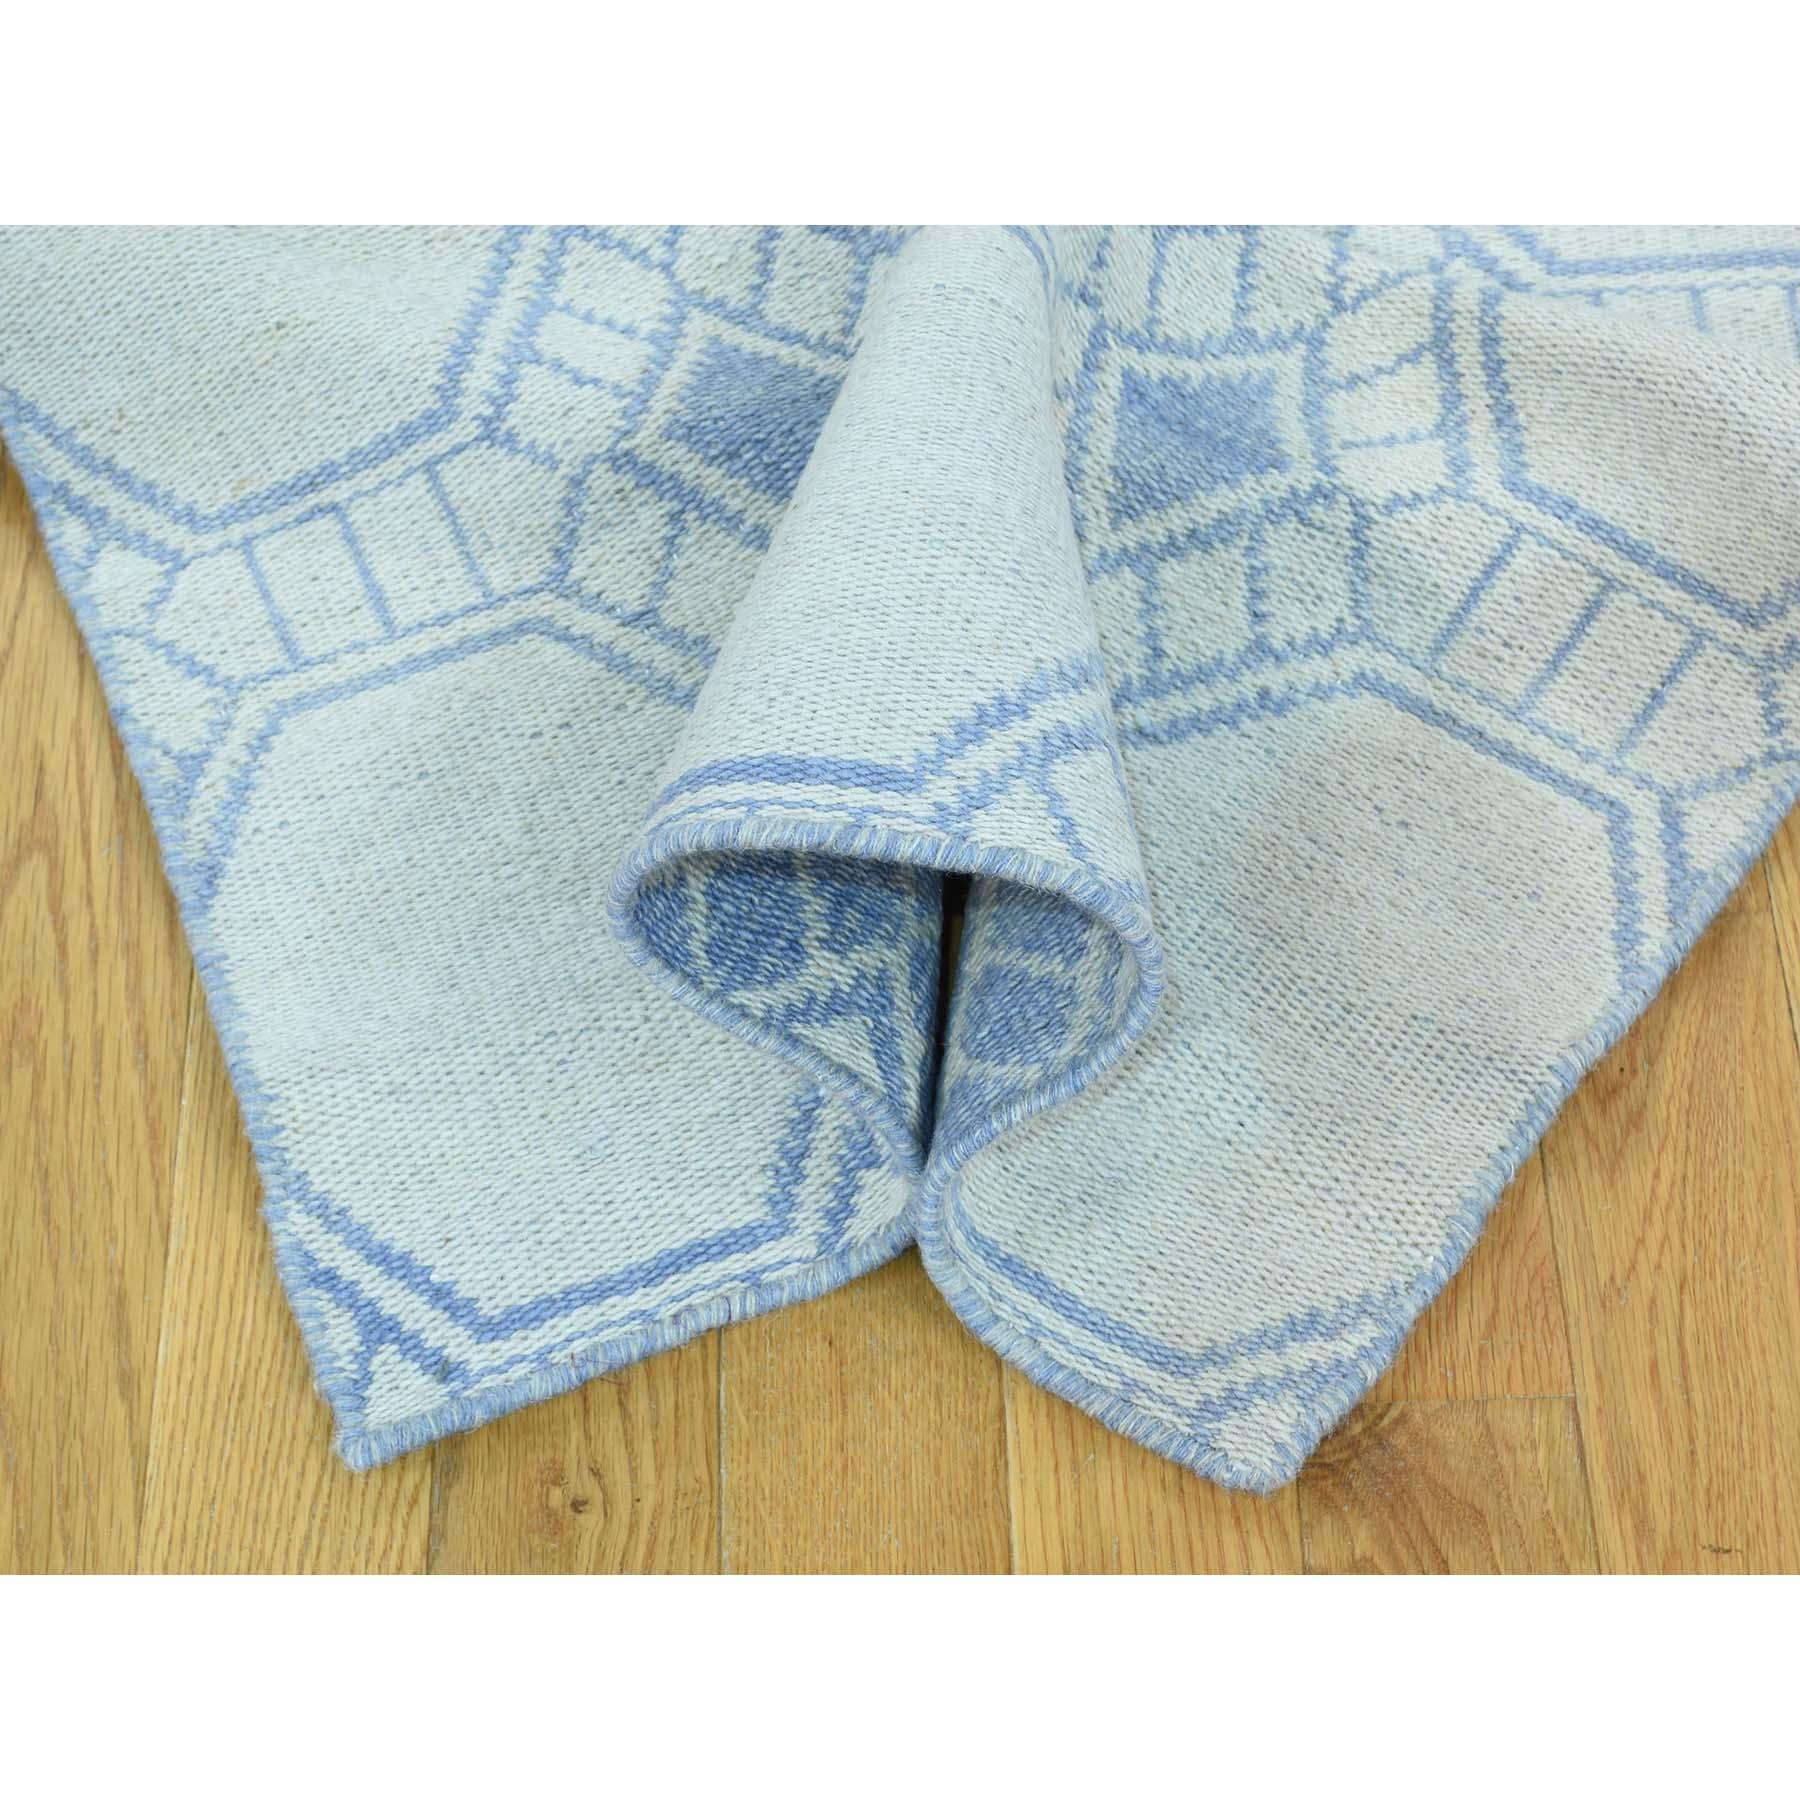 2-6 x10- Reversible Hand-Woven Flat Weave Durie Kilim Runner Rug